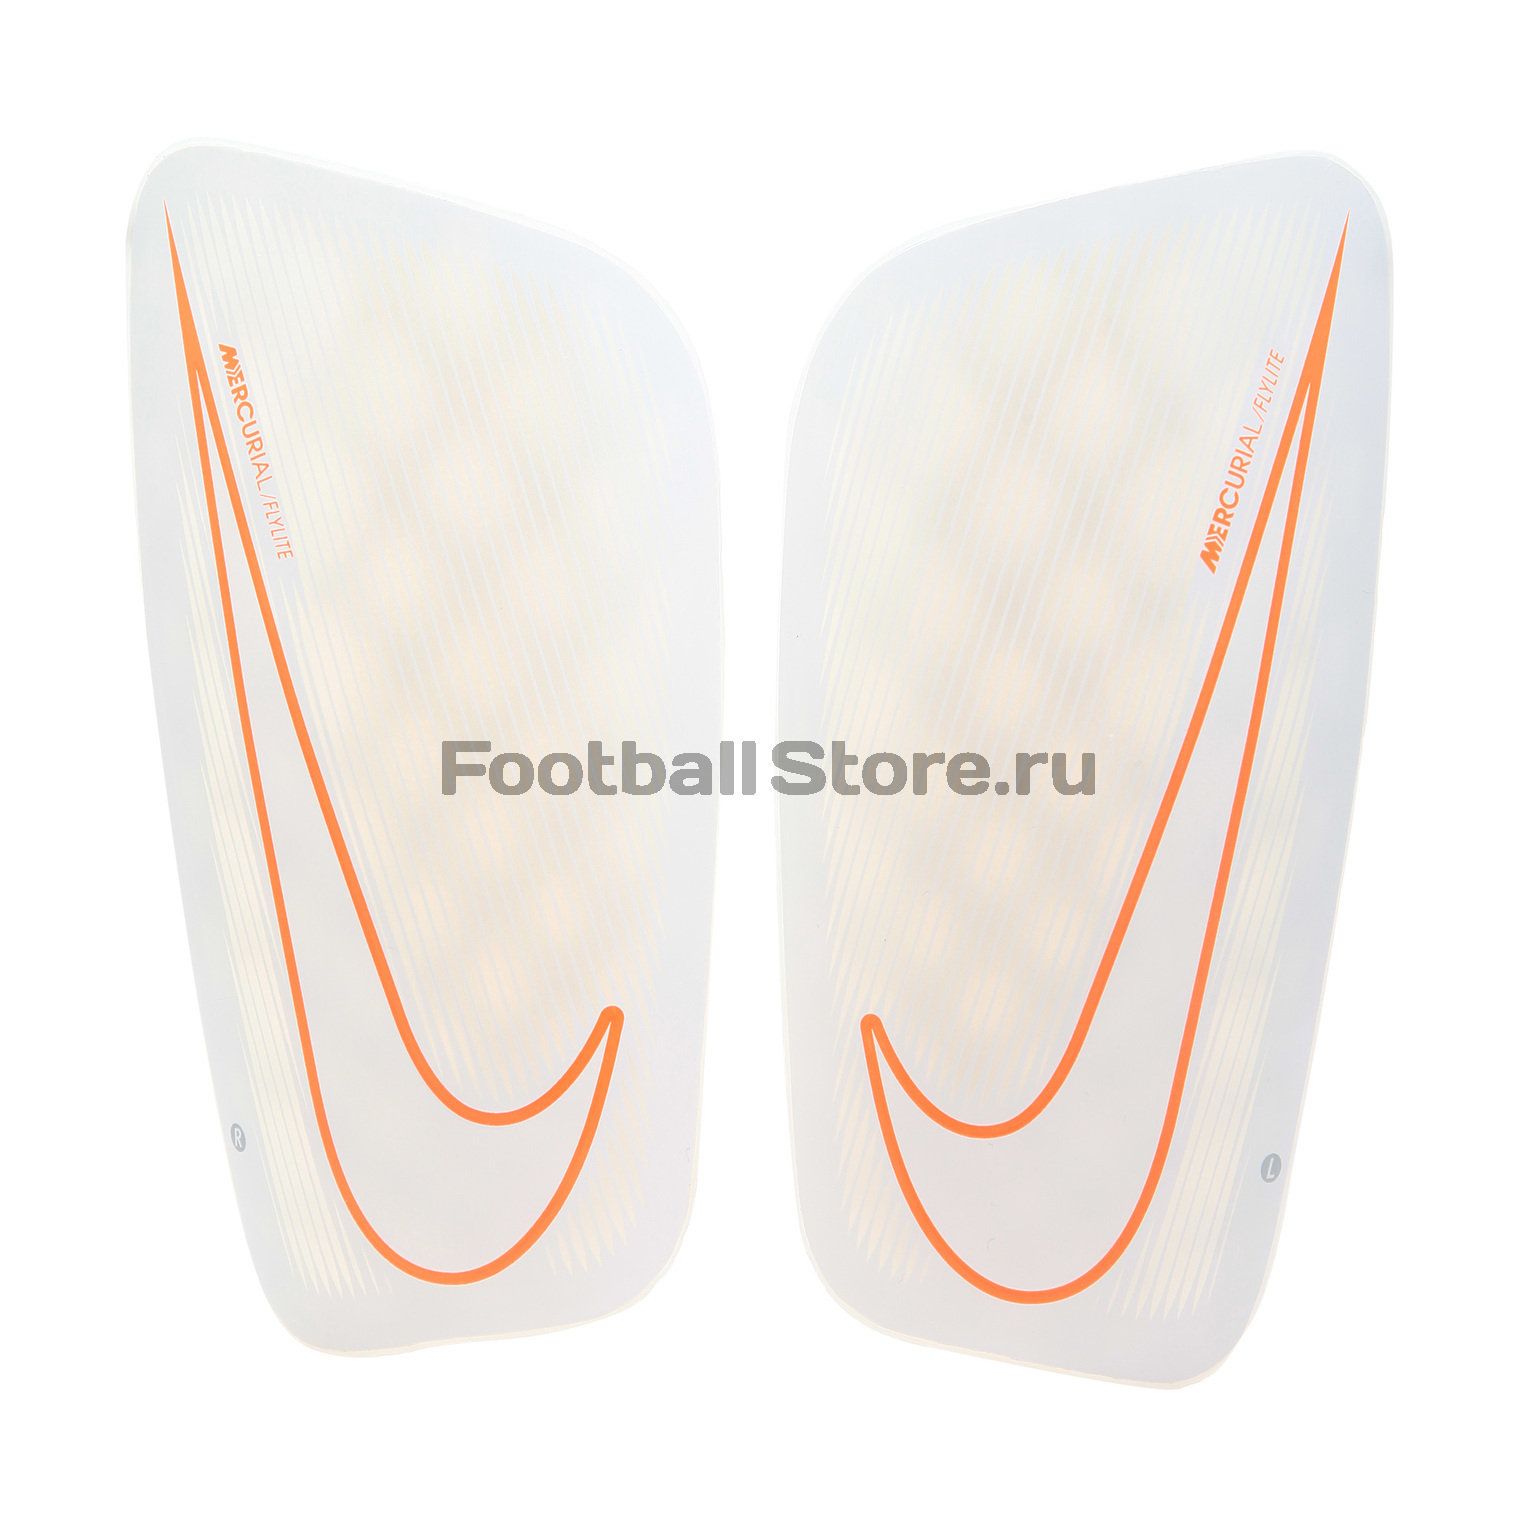 Щитки Nike Mercurial Flylite GRD SP2085-102 бутсы nike mercurial victory iii fg 509128 800